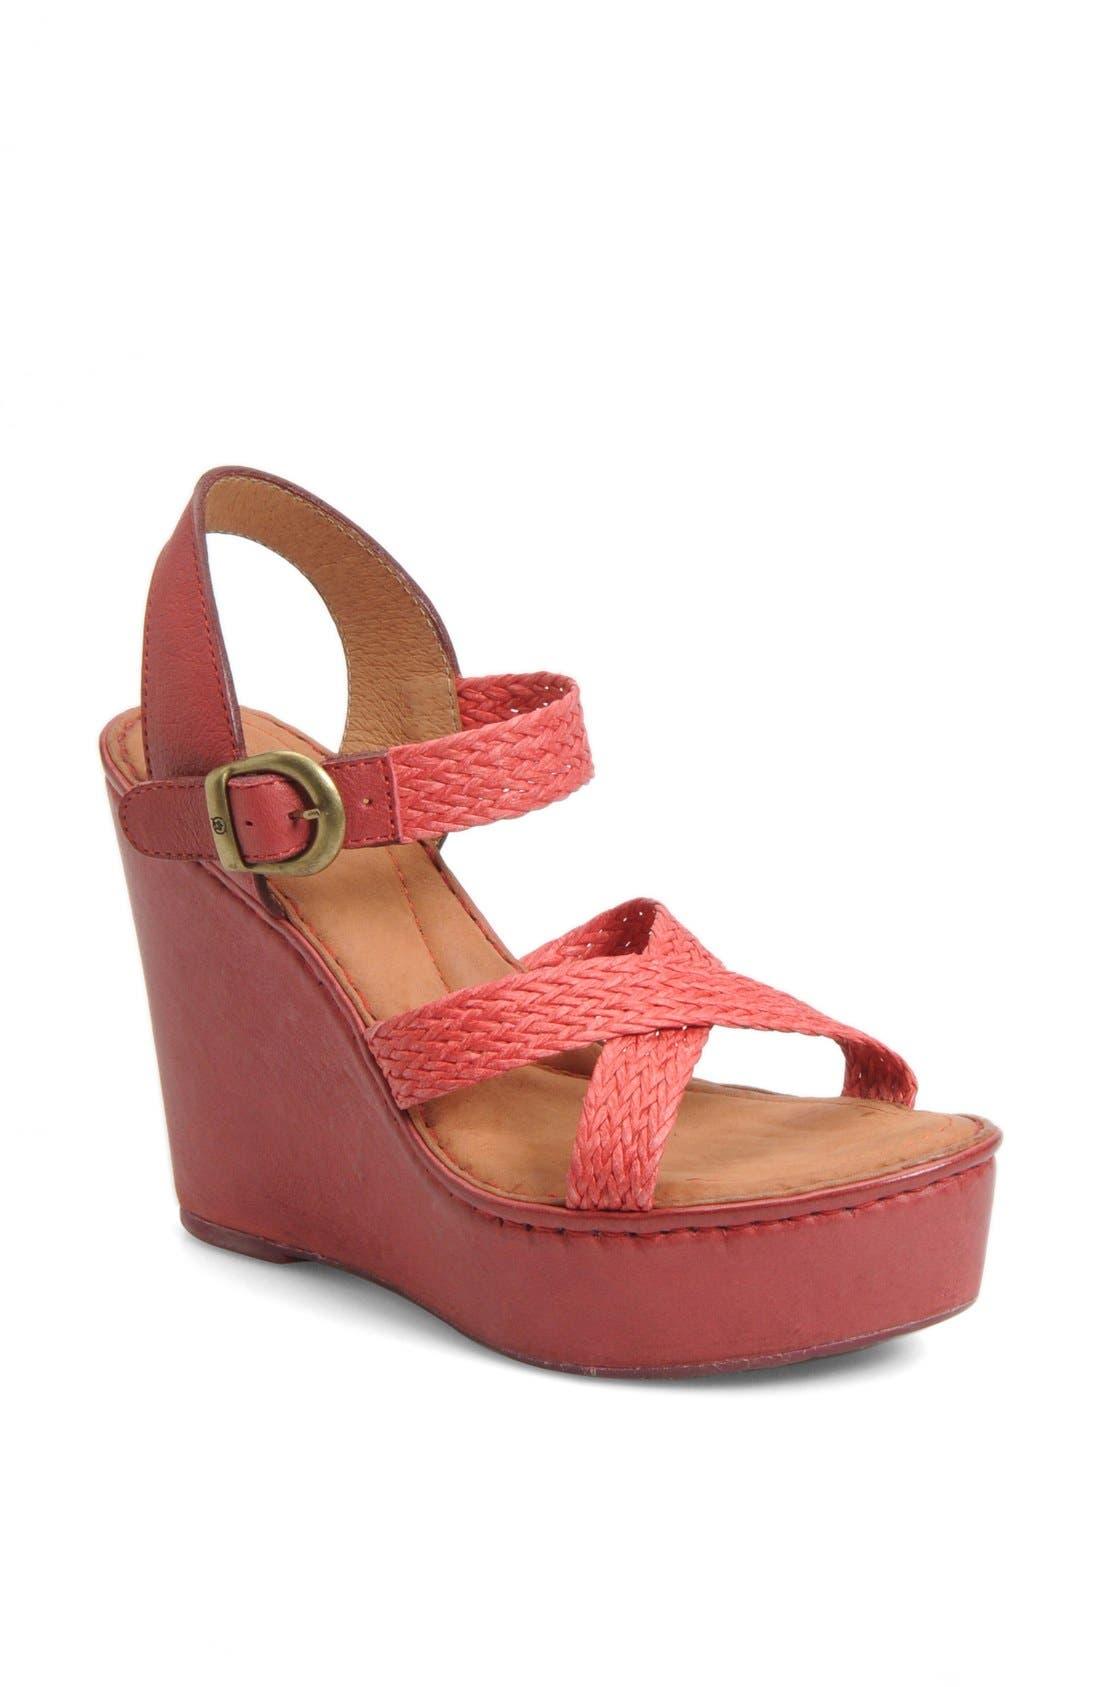 Main Image - Børn 'Estefania' Wedge Sandal